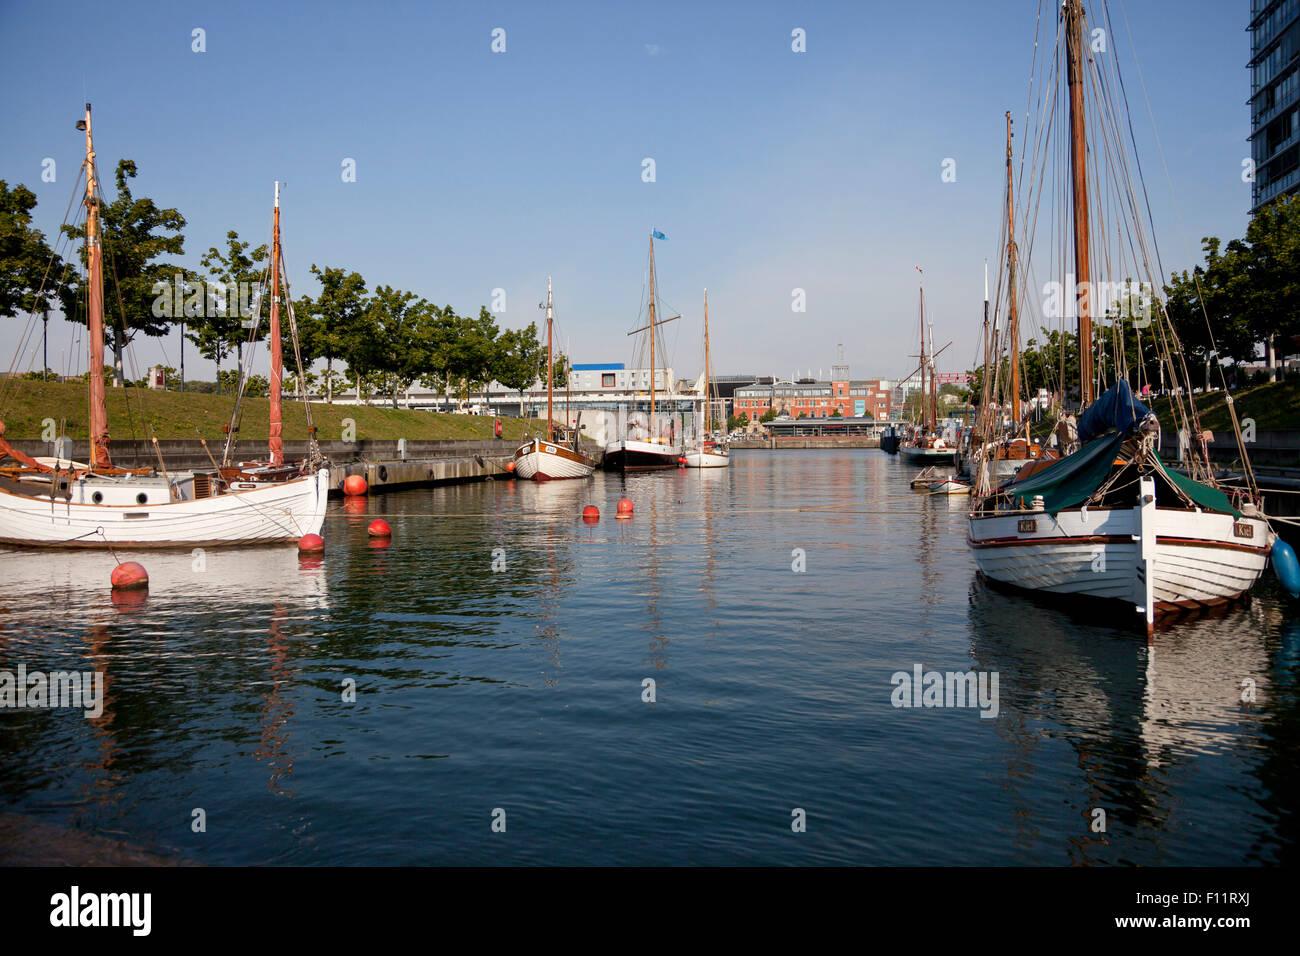 Navi tradizionali al Germania Harbour, Kiel, Schleswig-Holstein, Germania Immagini Stock